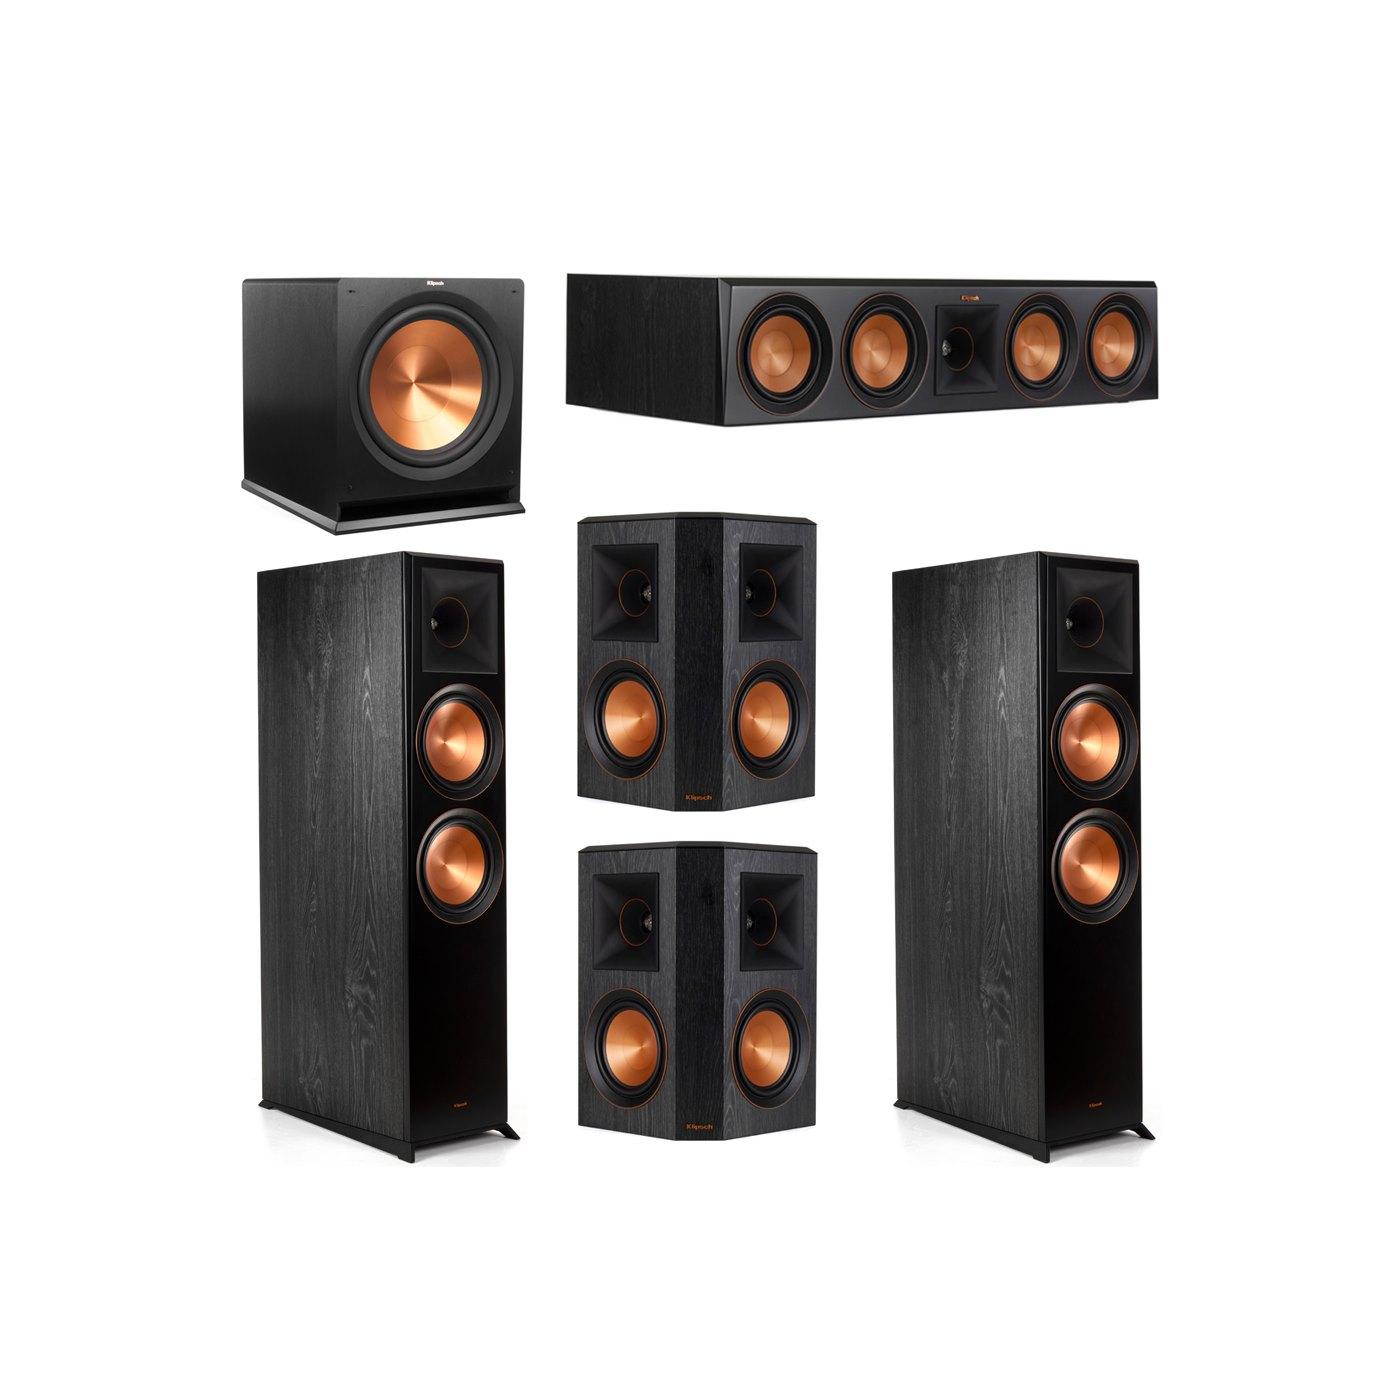 Klipsch 5.1 System with 2 RP-8000F Floorstanding Speakers, 1 Klipsch RP-504C Center Speaker, 2 Klipsch RP-502S Surround Speakers, 1 Klipsch R-115SW Subwoofer